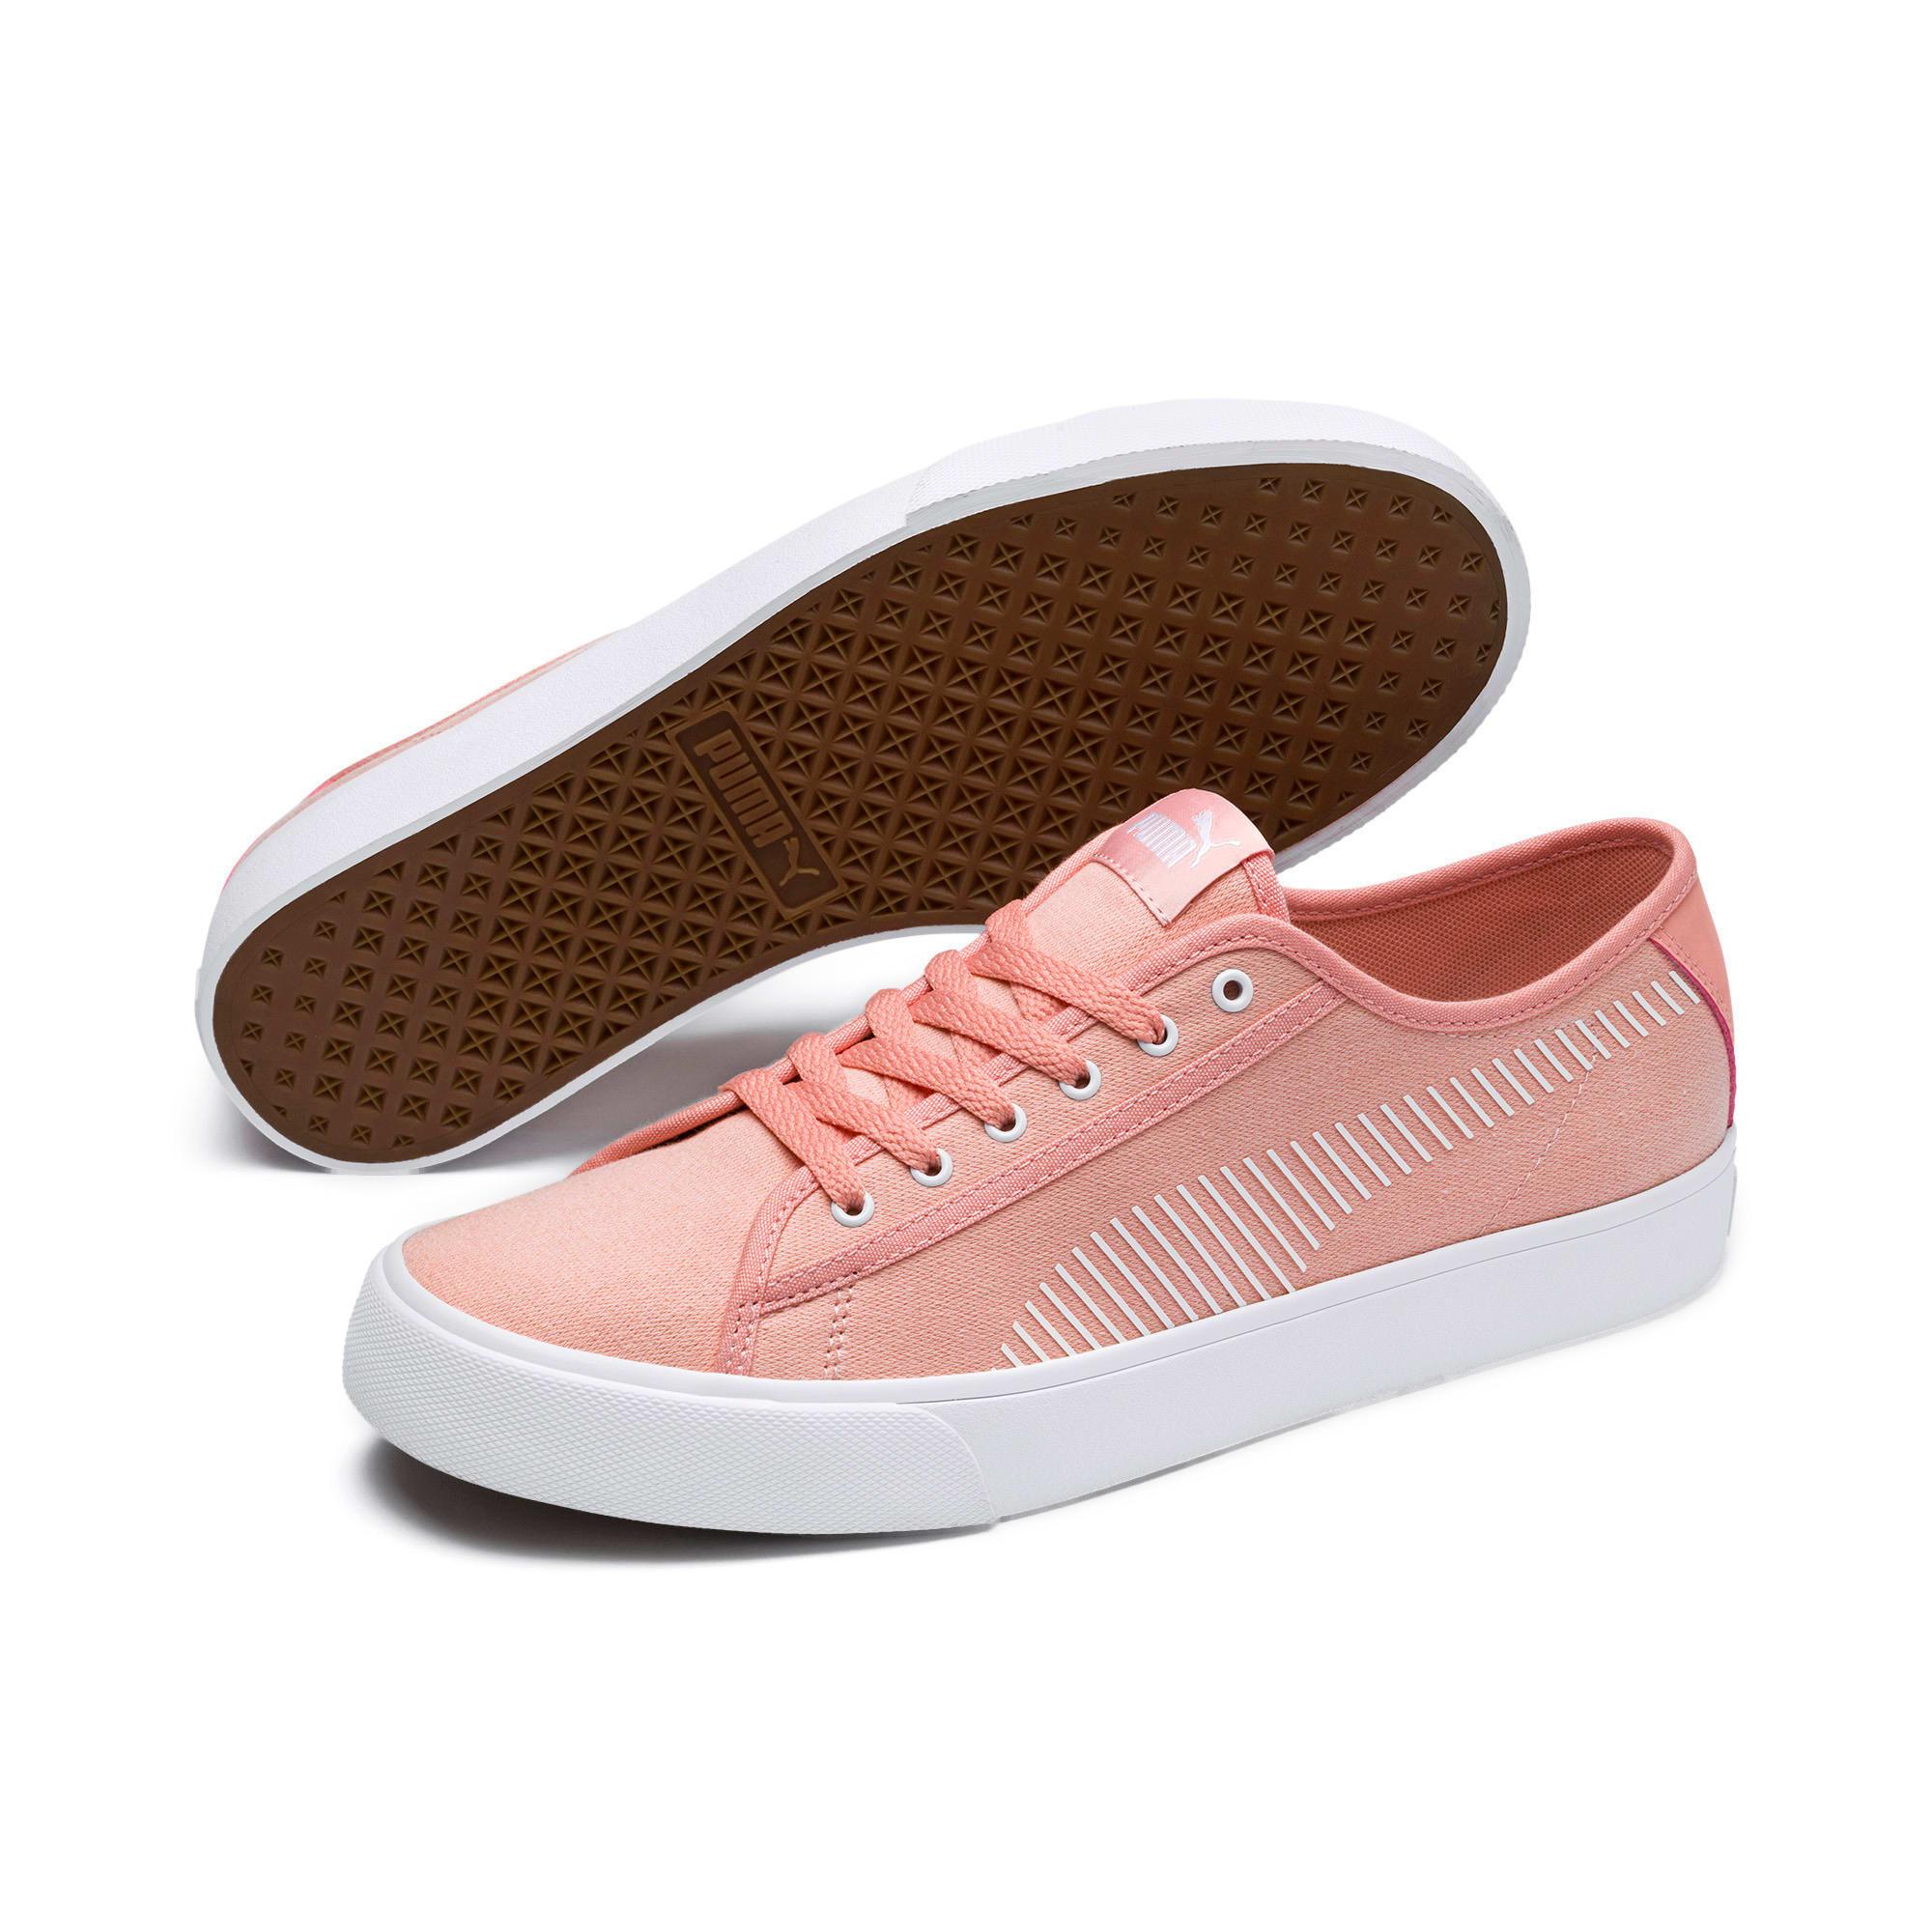 Thumbnail 2 of Bari Sneakers, Peach Bud-Puma White, medium